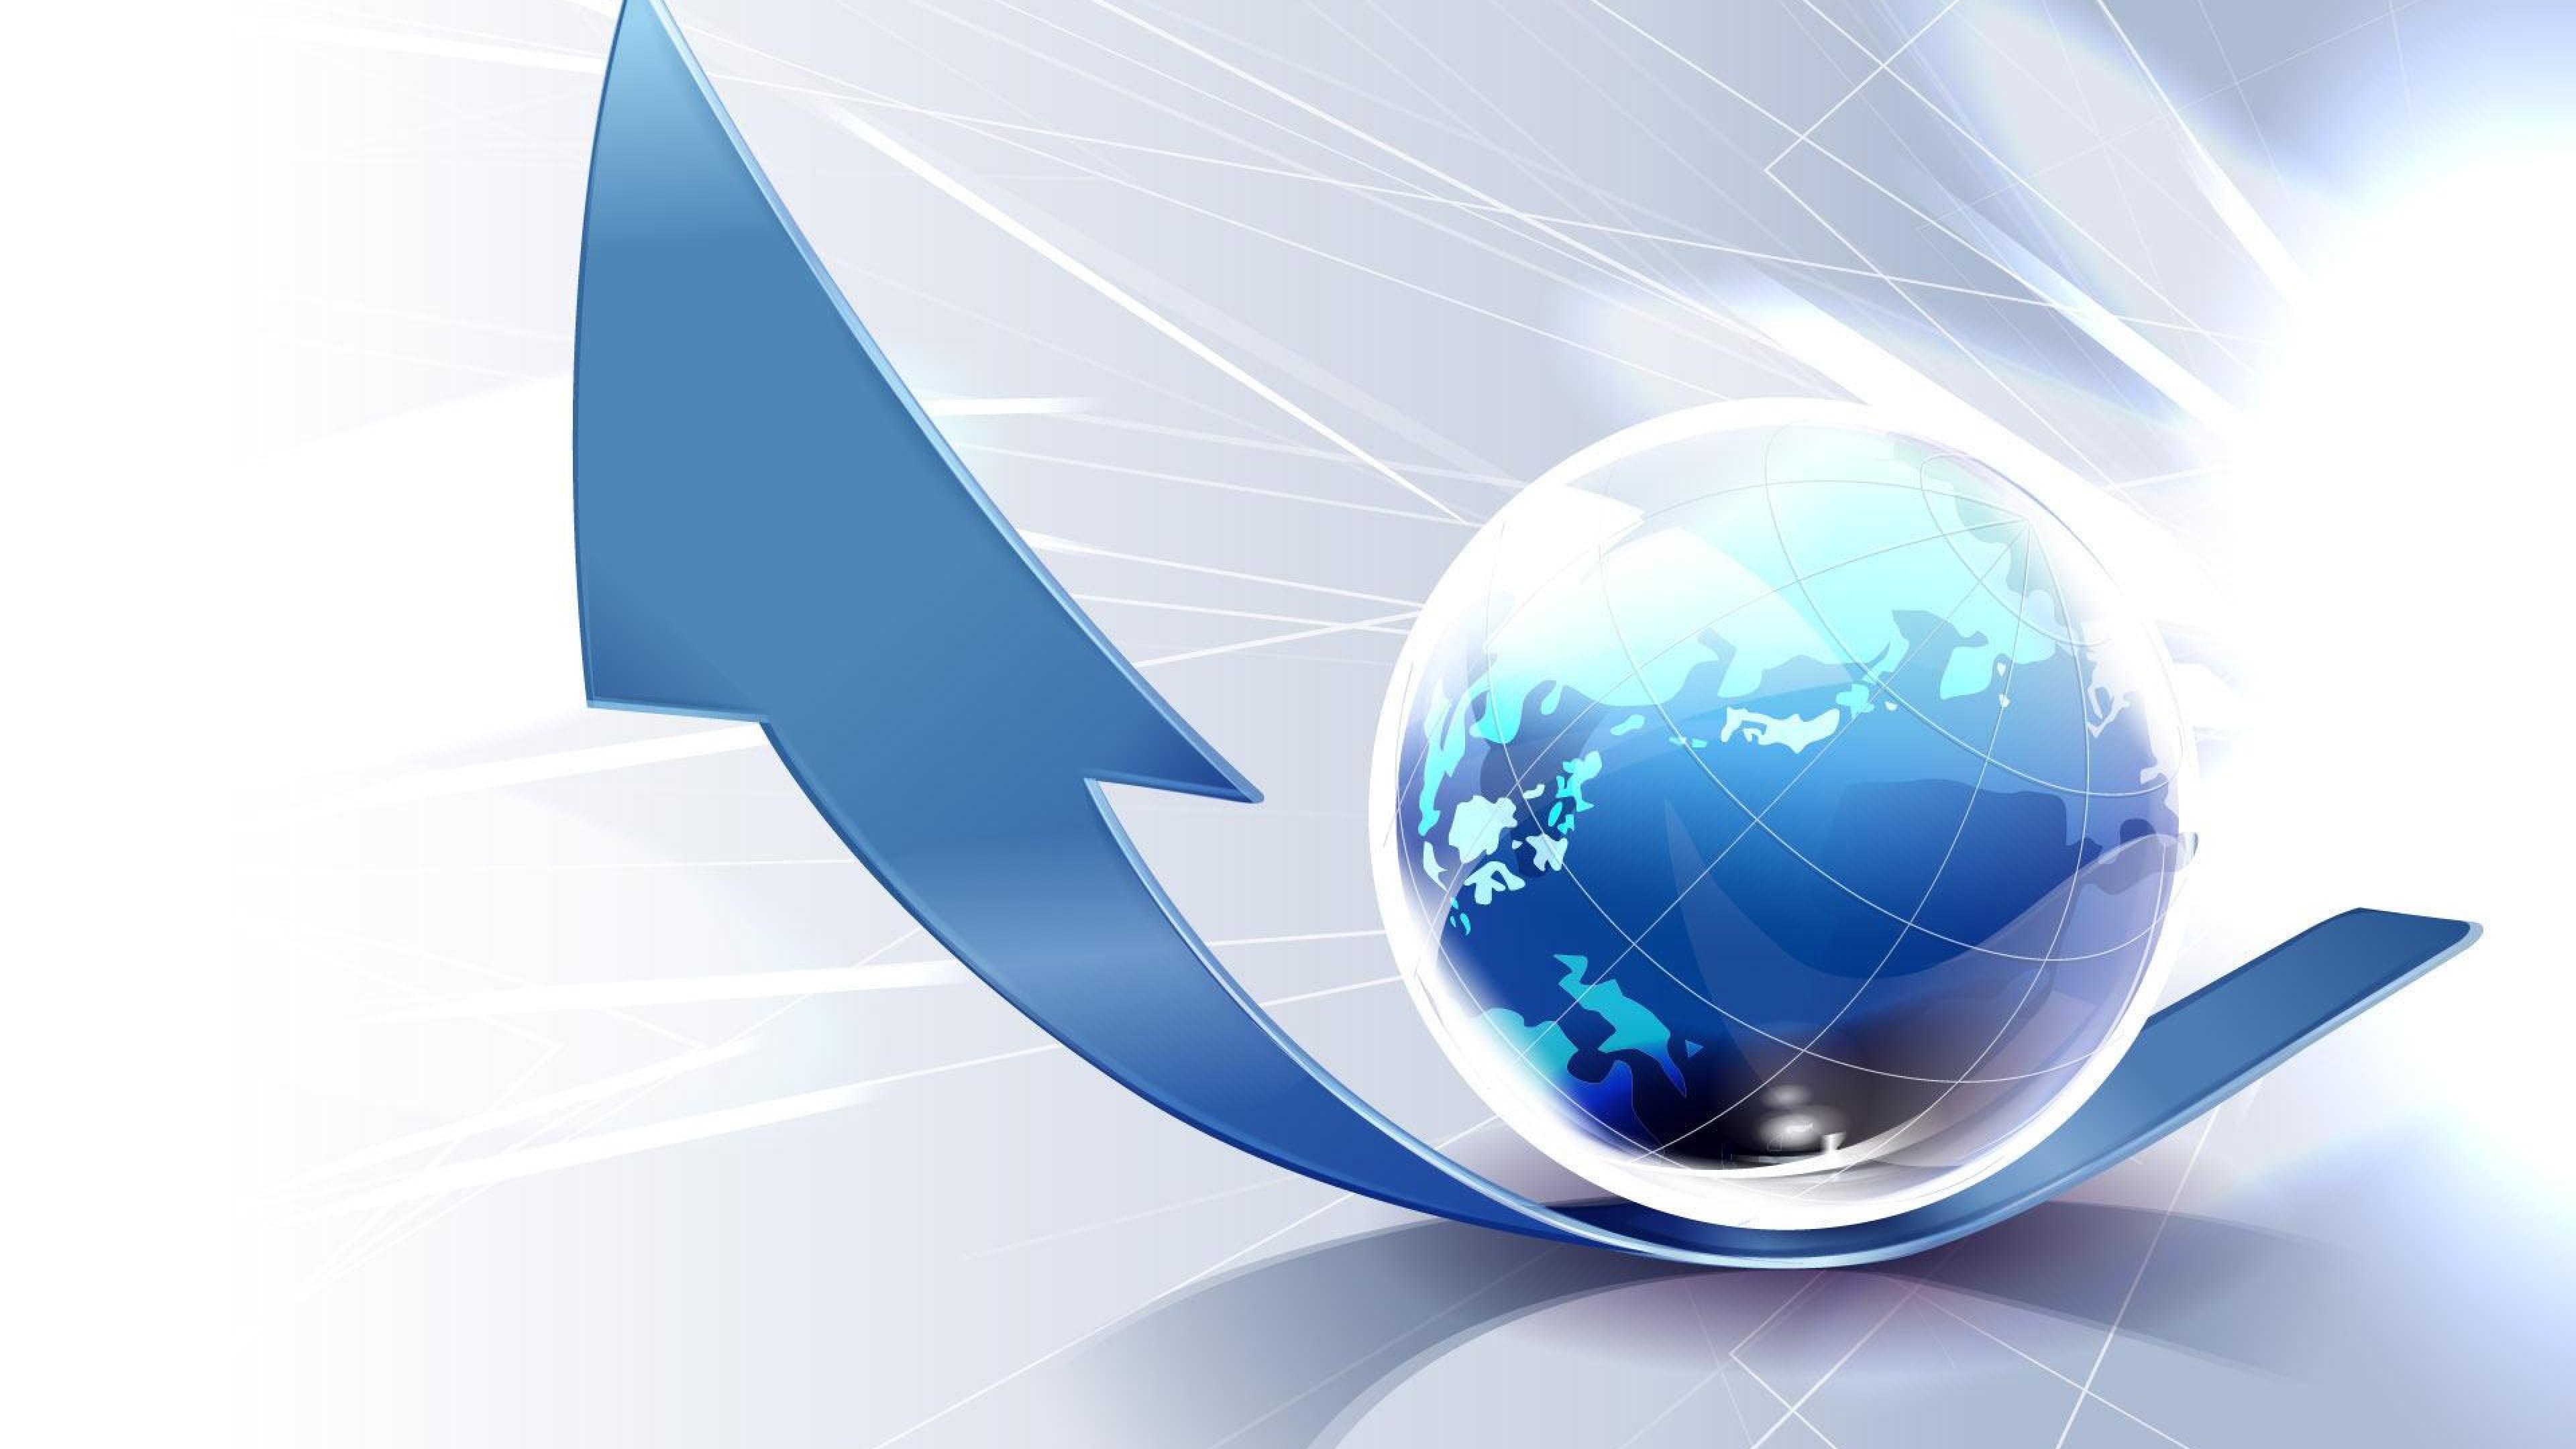 74 globe wallpaper on wallpapersafari - Digital world hd ...